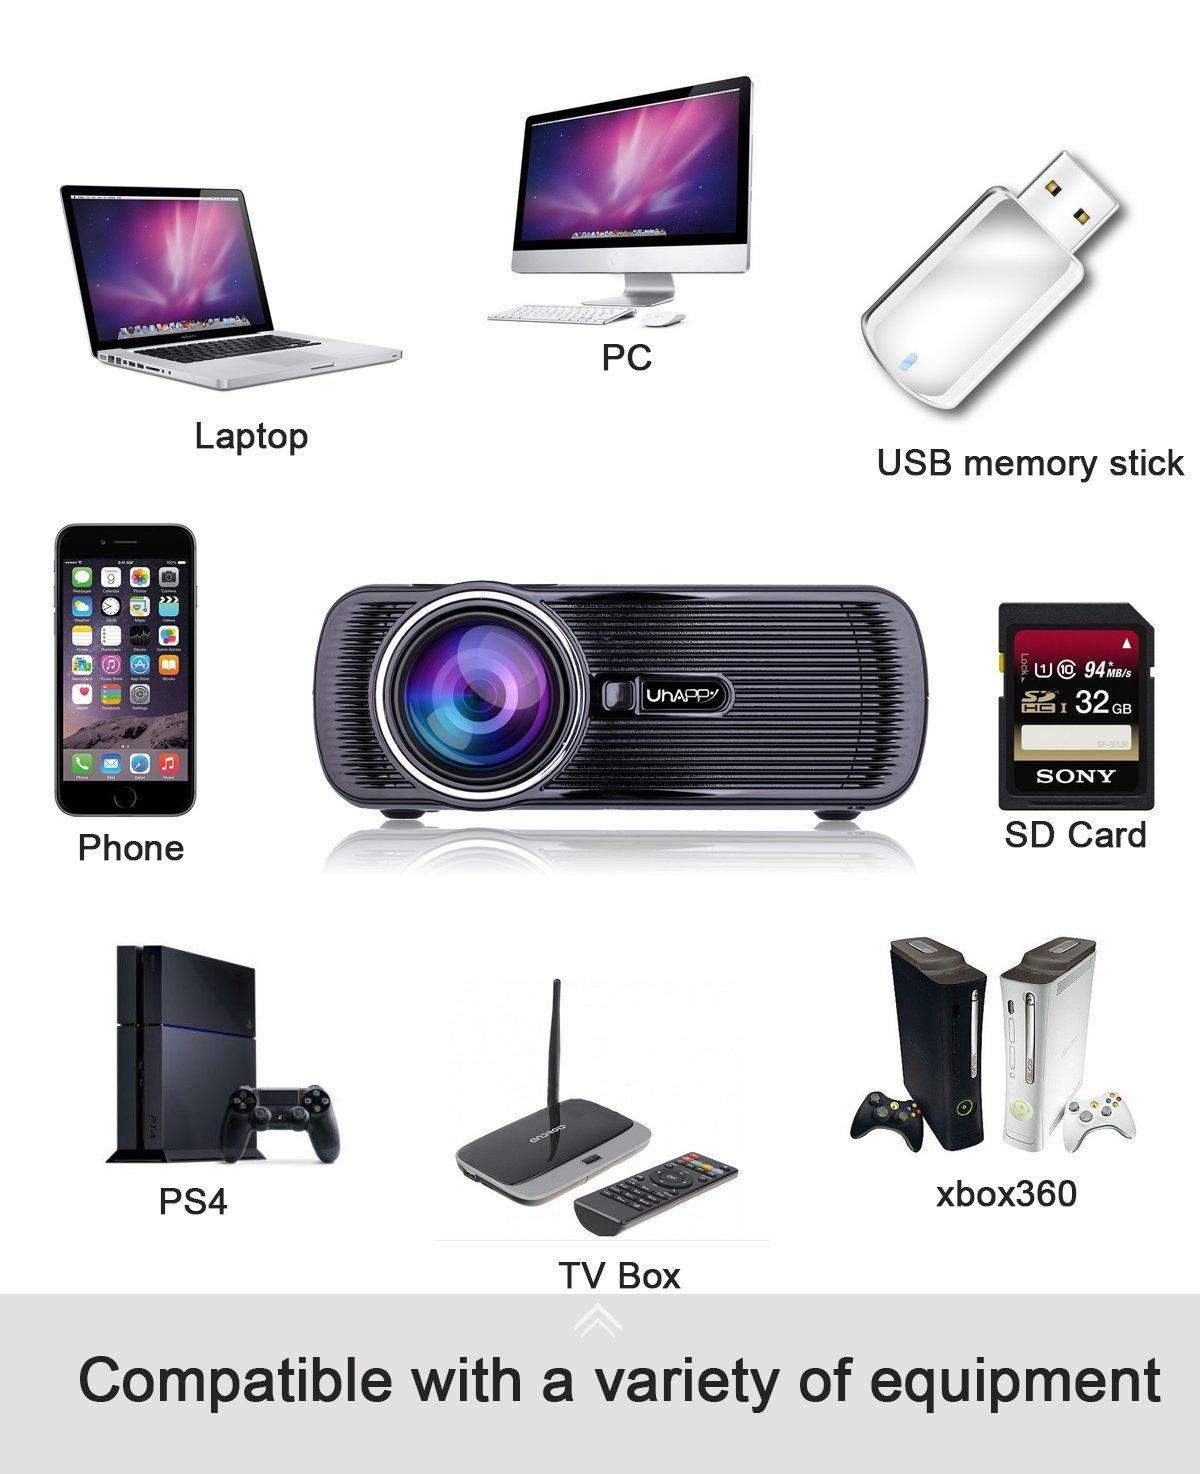 Amazon.com: Uhappy U80 Portable Home Theater 1080P LED HD Mini Digital Projector, Support HDMI, VGA, USB: Electronics